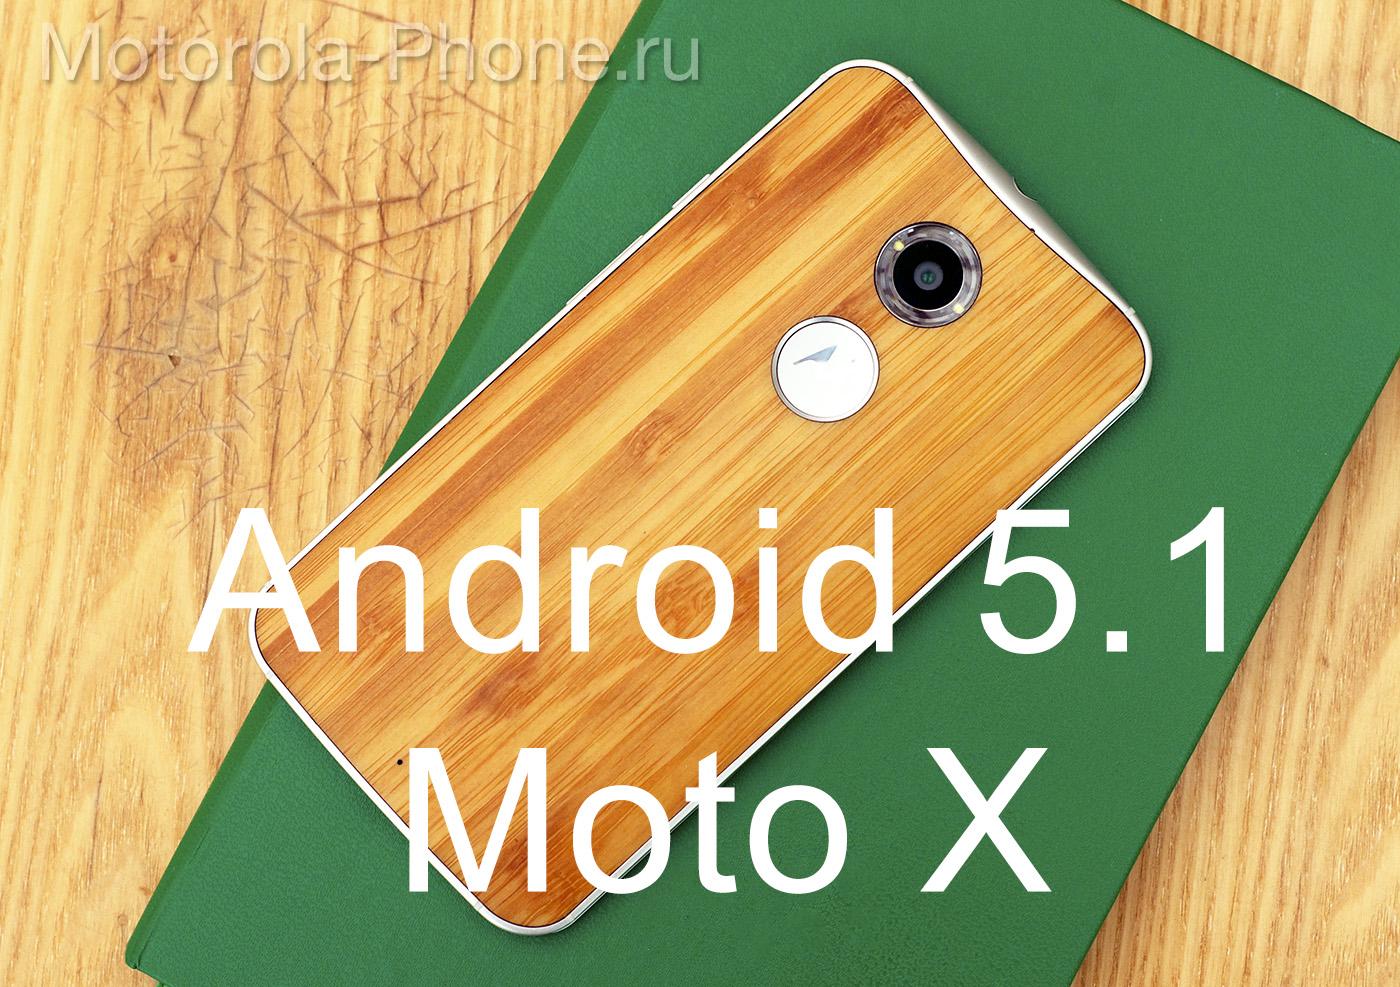 Motorola-Moto-X-2014-Android-5-1-14